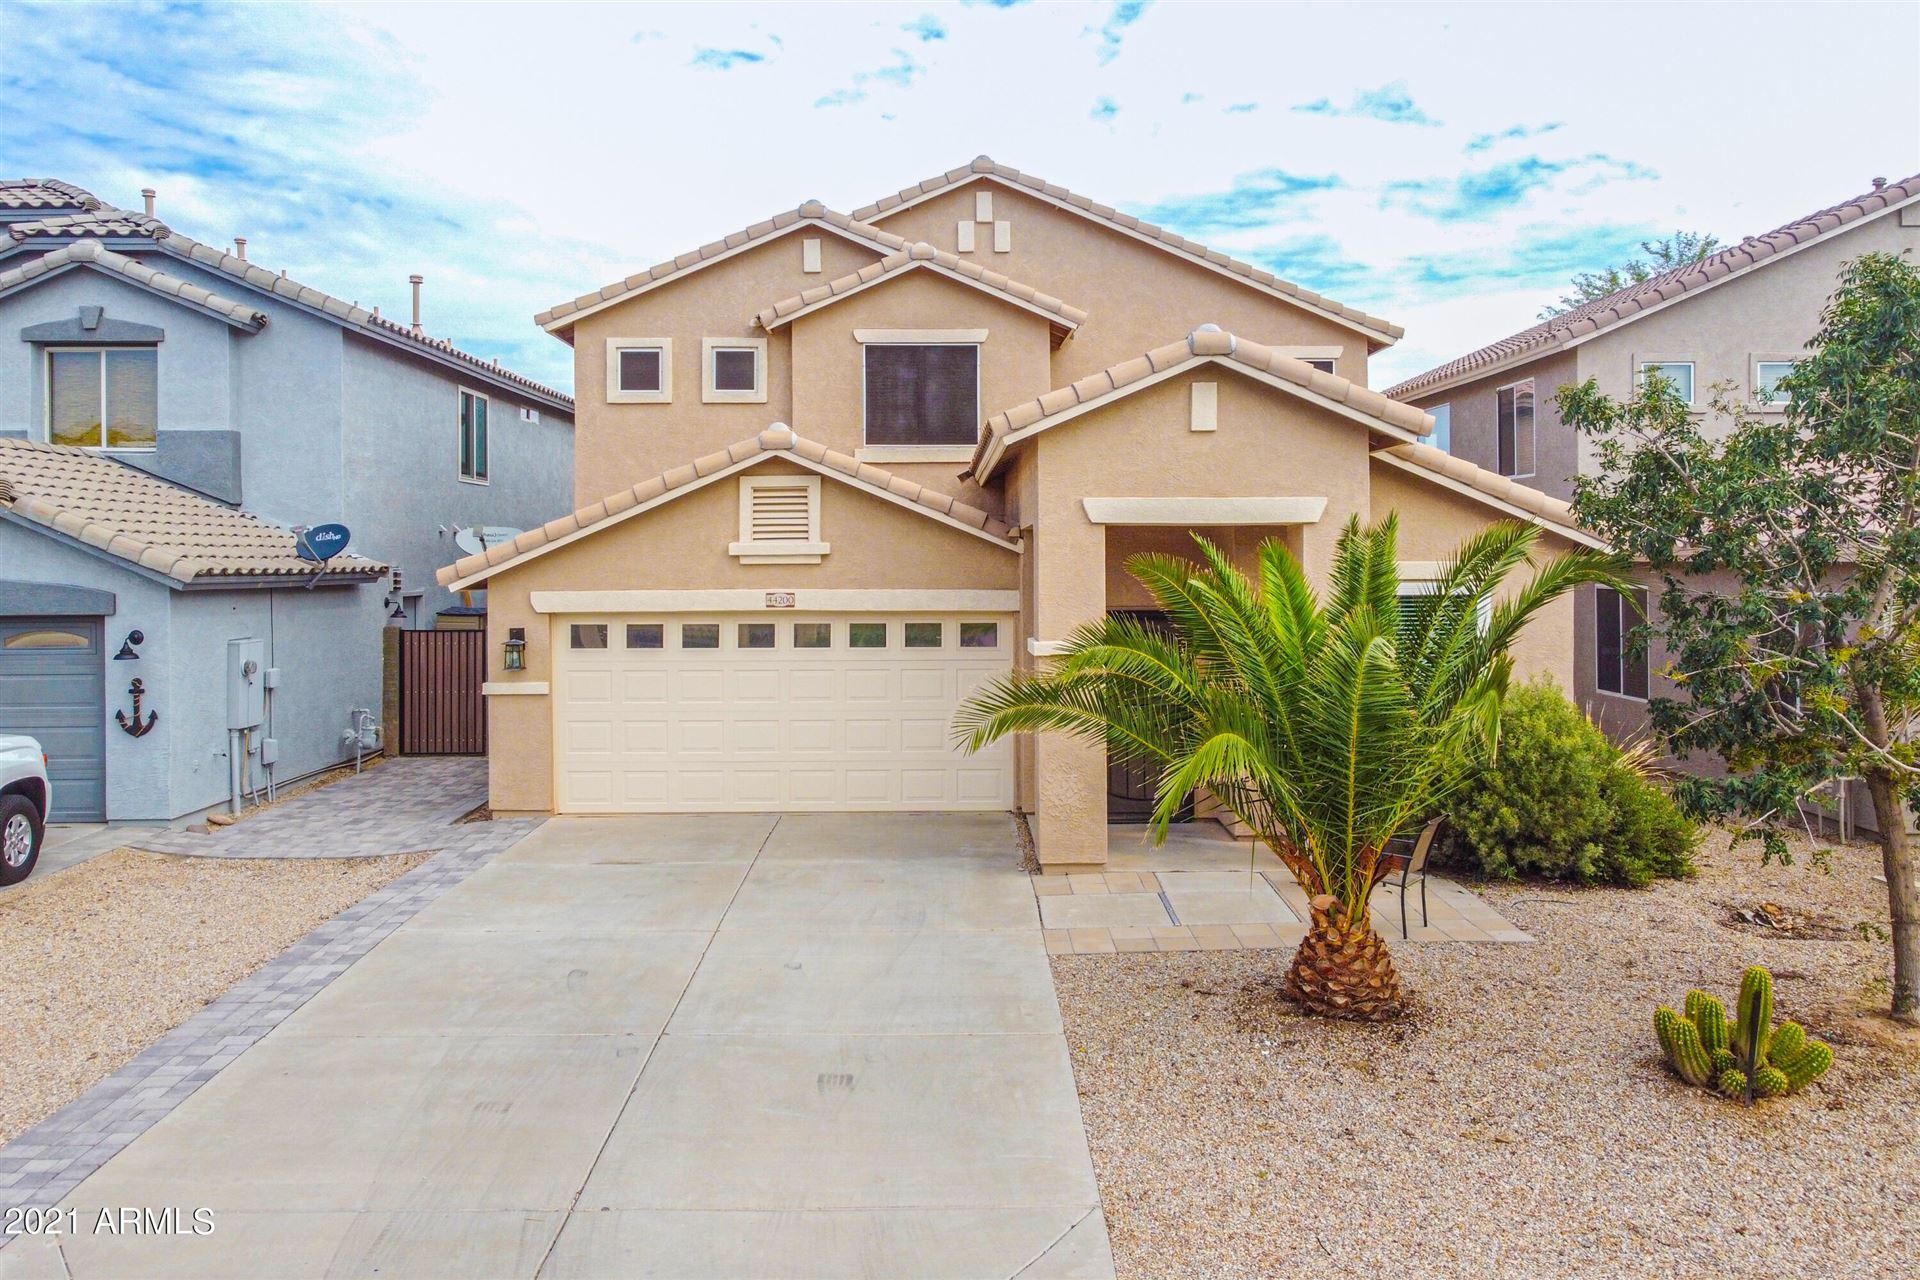 Photo for 44200 W MCCLELLAND Drive, Maricopa, AZ 85138 (MLS # 6291243)